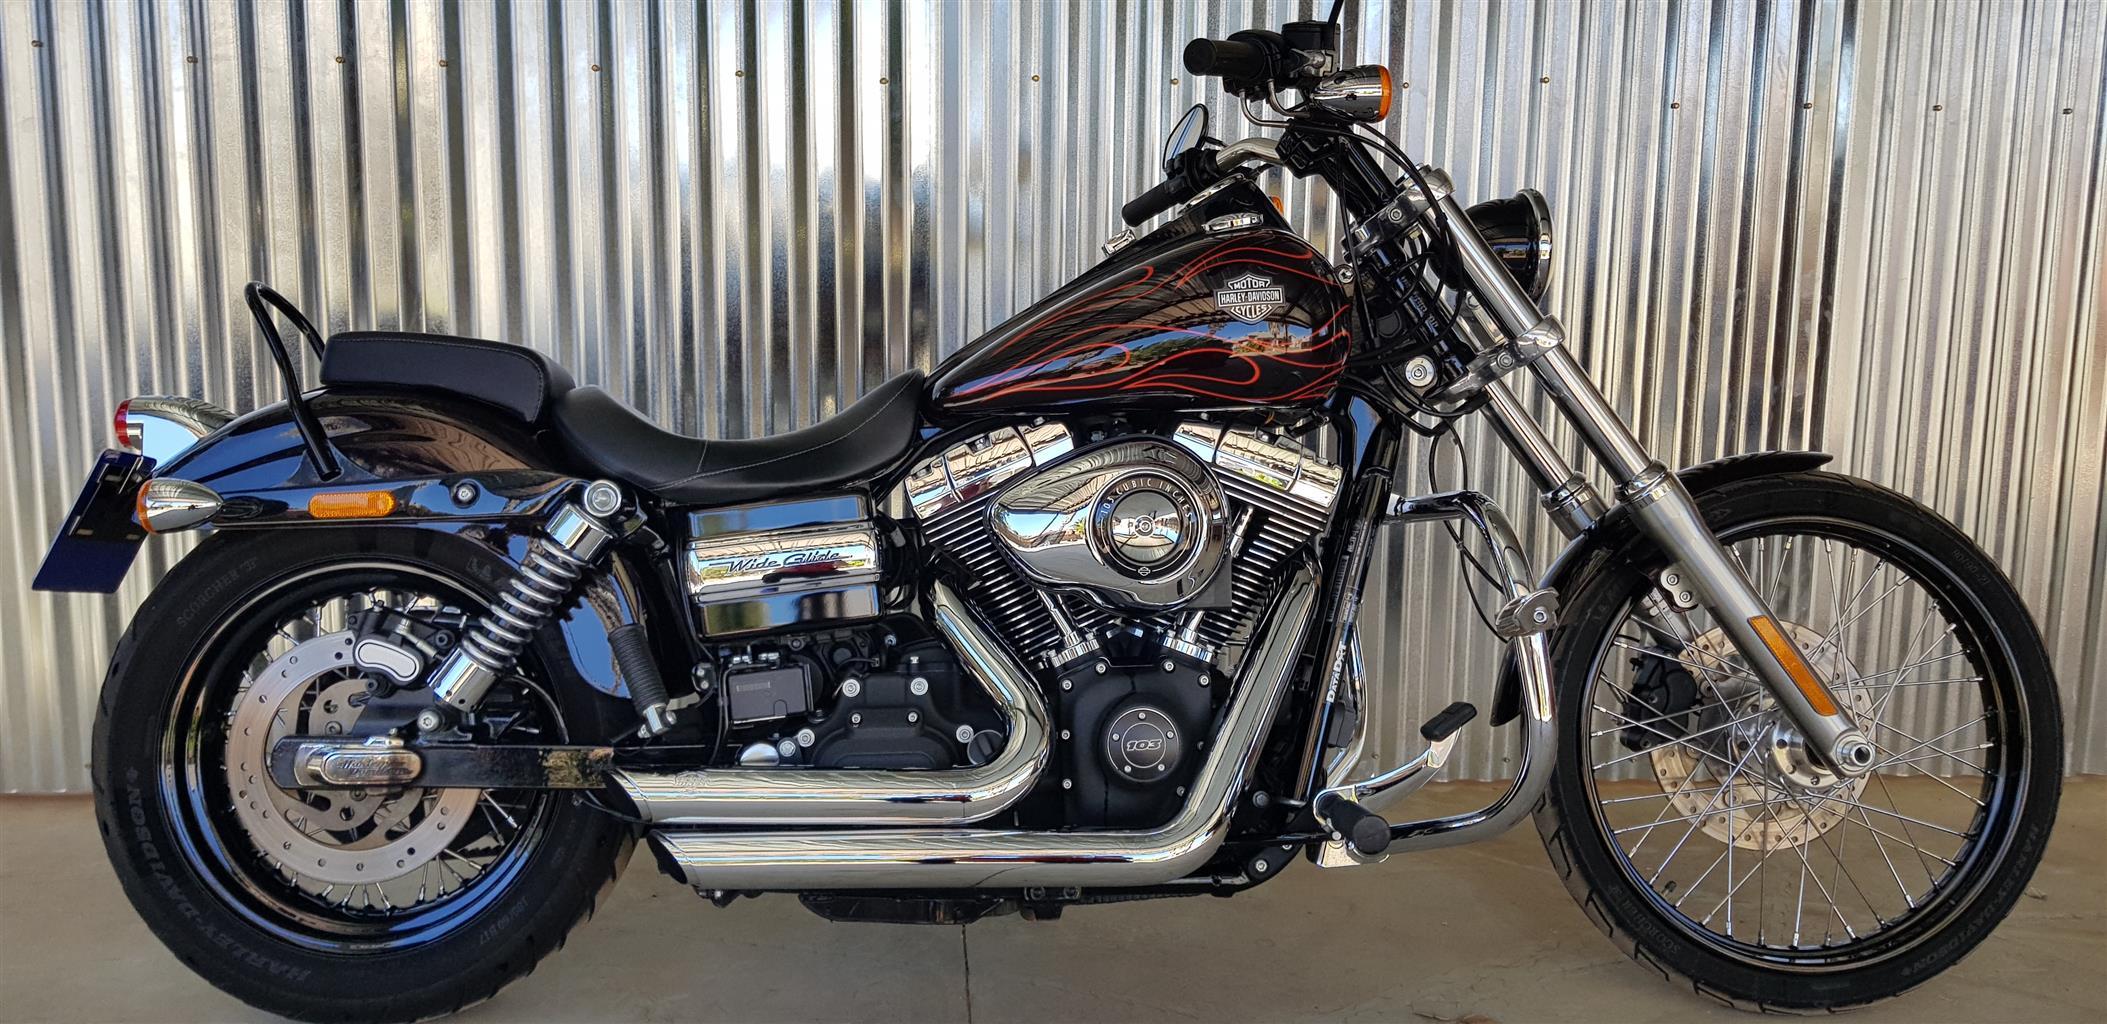 2014 Harley Davidson Dyna Wide Glide